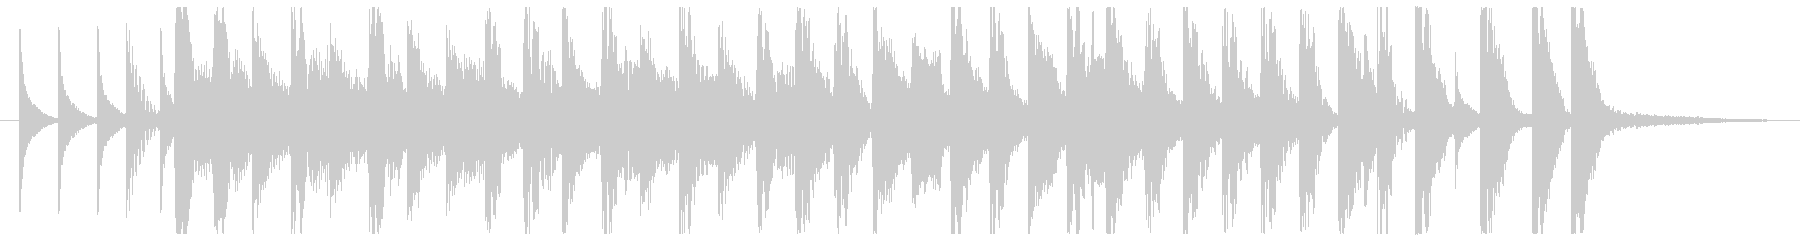 ElectroPop1・カワイイ・ポップの未再生の波形